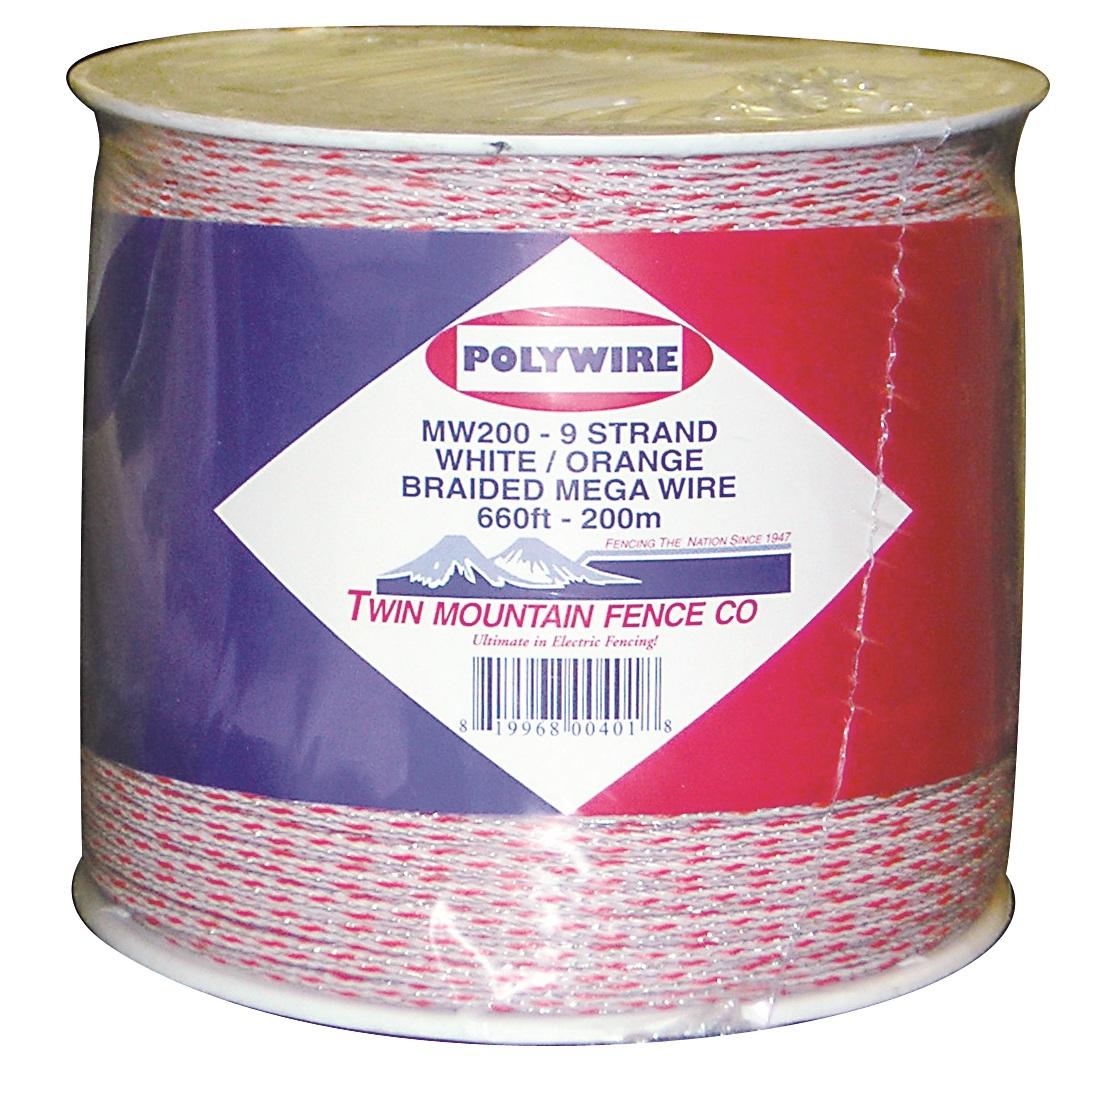 660' Braided Mega Wire